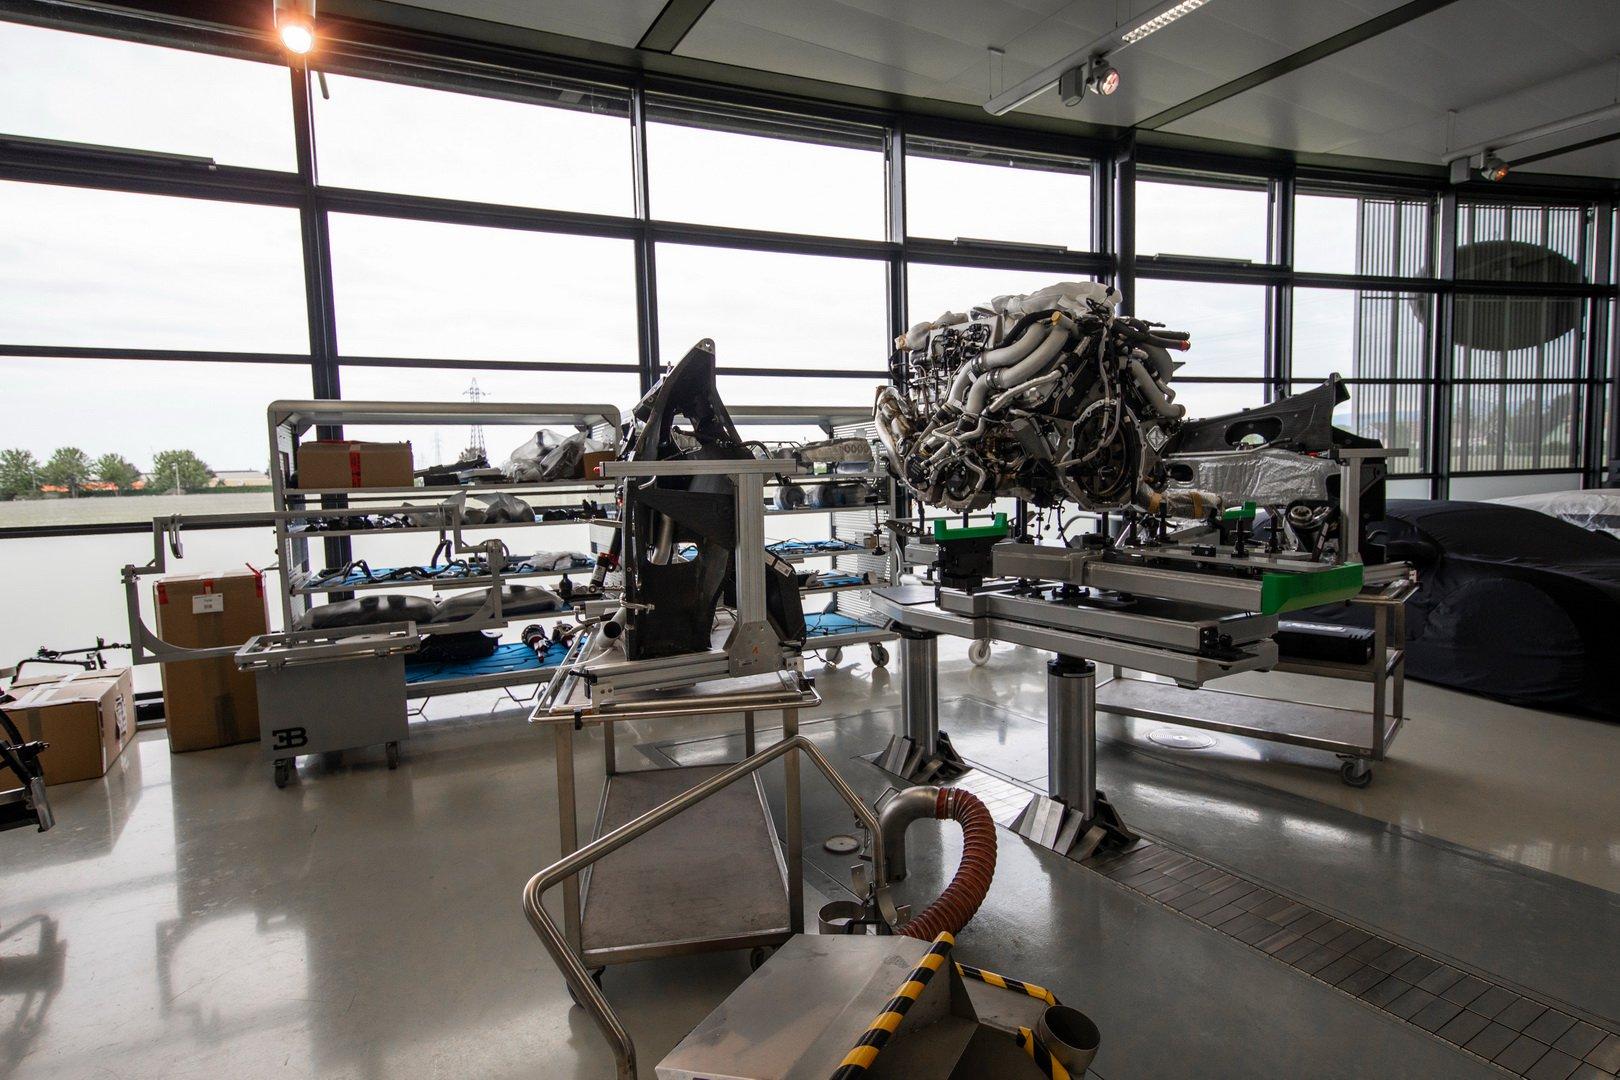 Bugatti-Chiron-Sport-110-Ans-Bugatti-production-plant-9